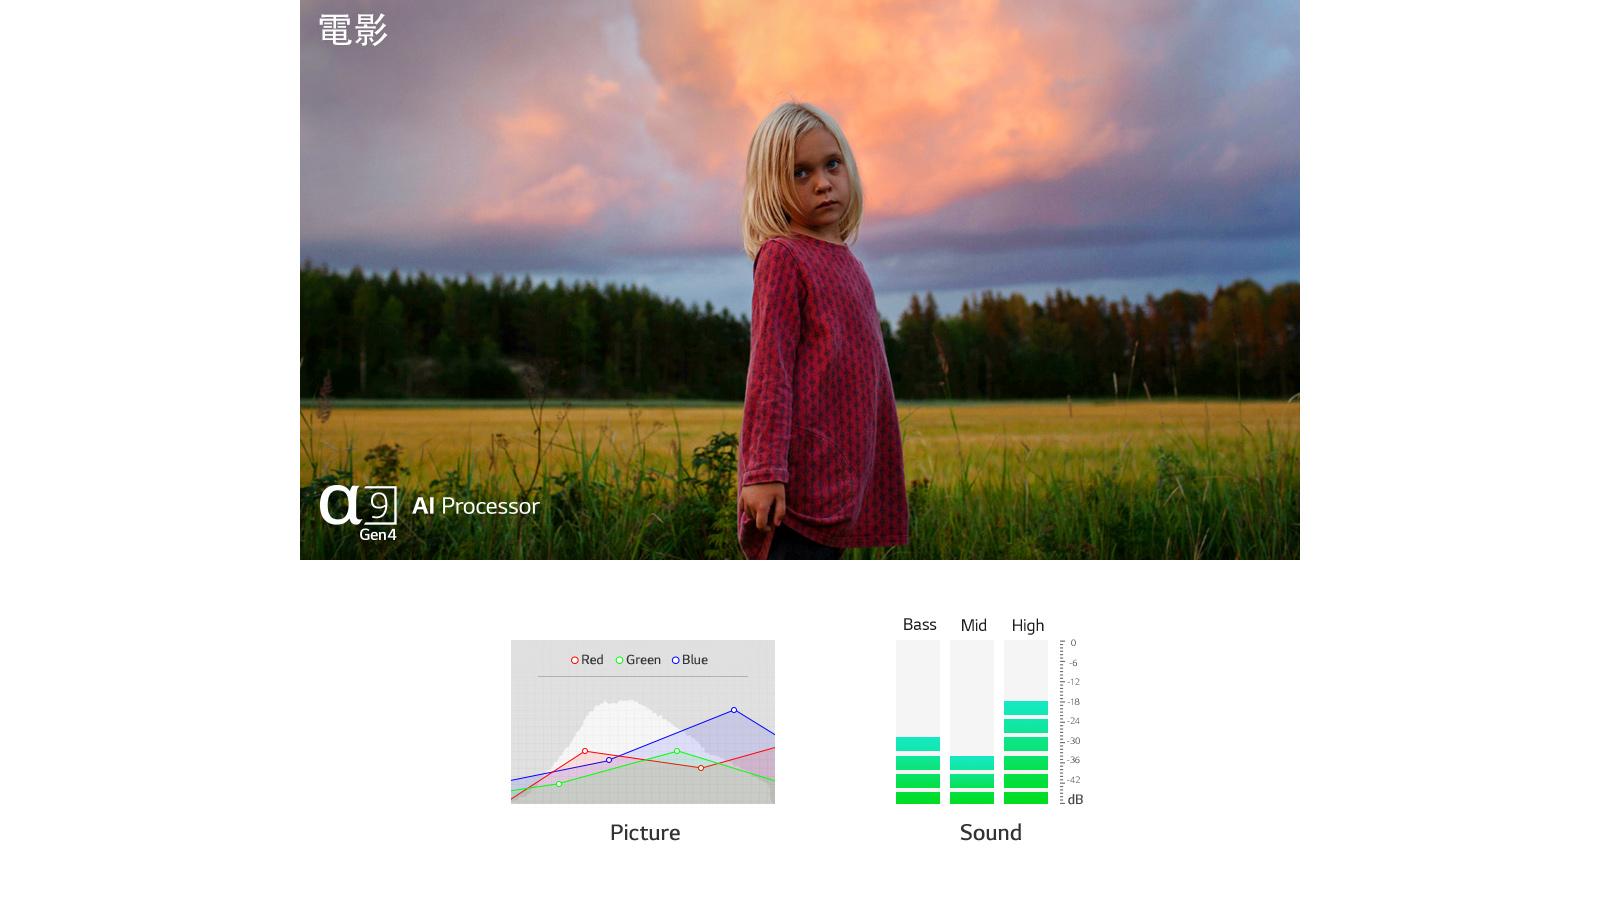 α9 第四代人工智能處理器自動提升了兩個場景的圖像和音效(播放影片)